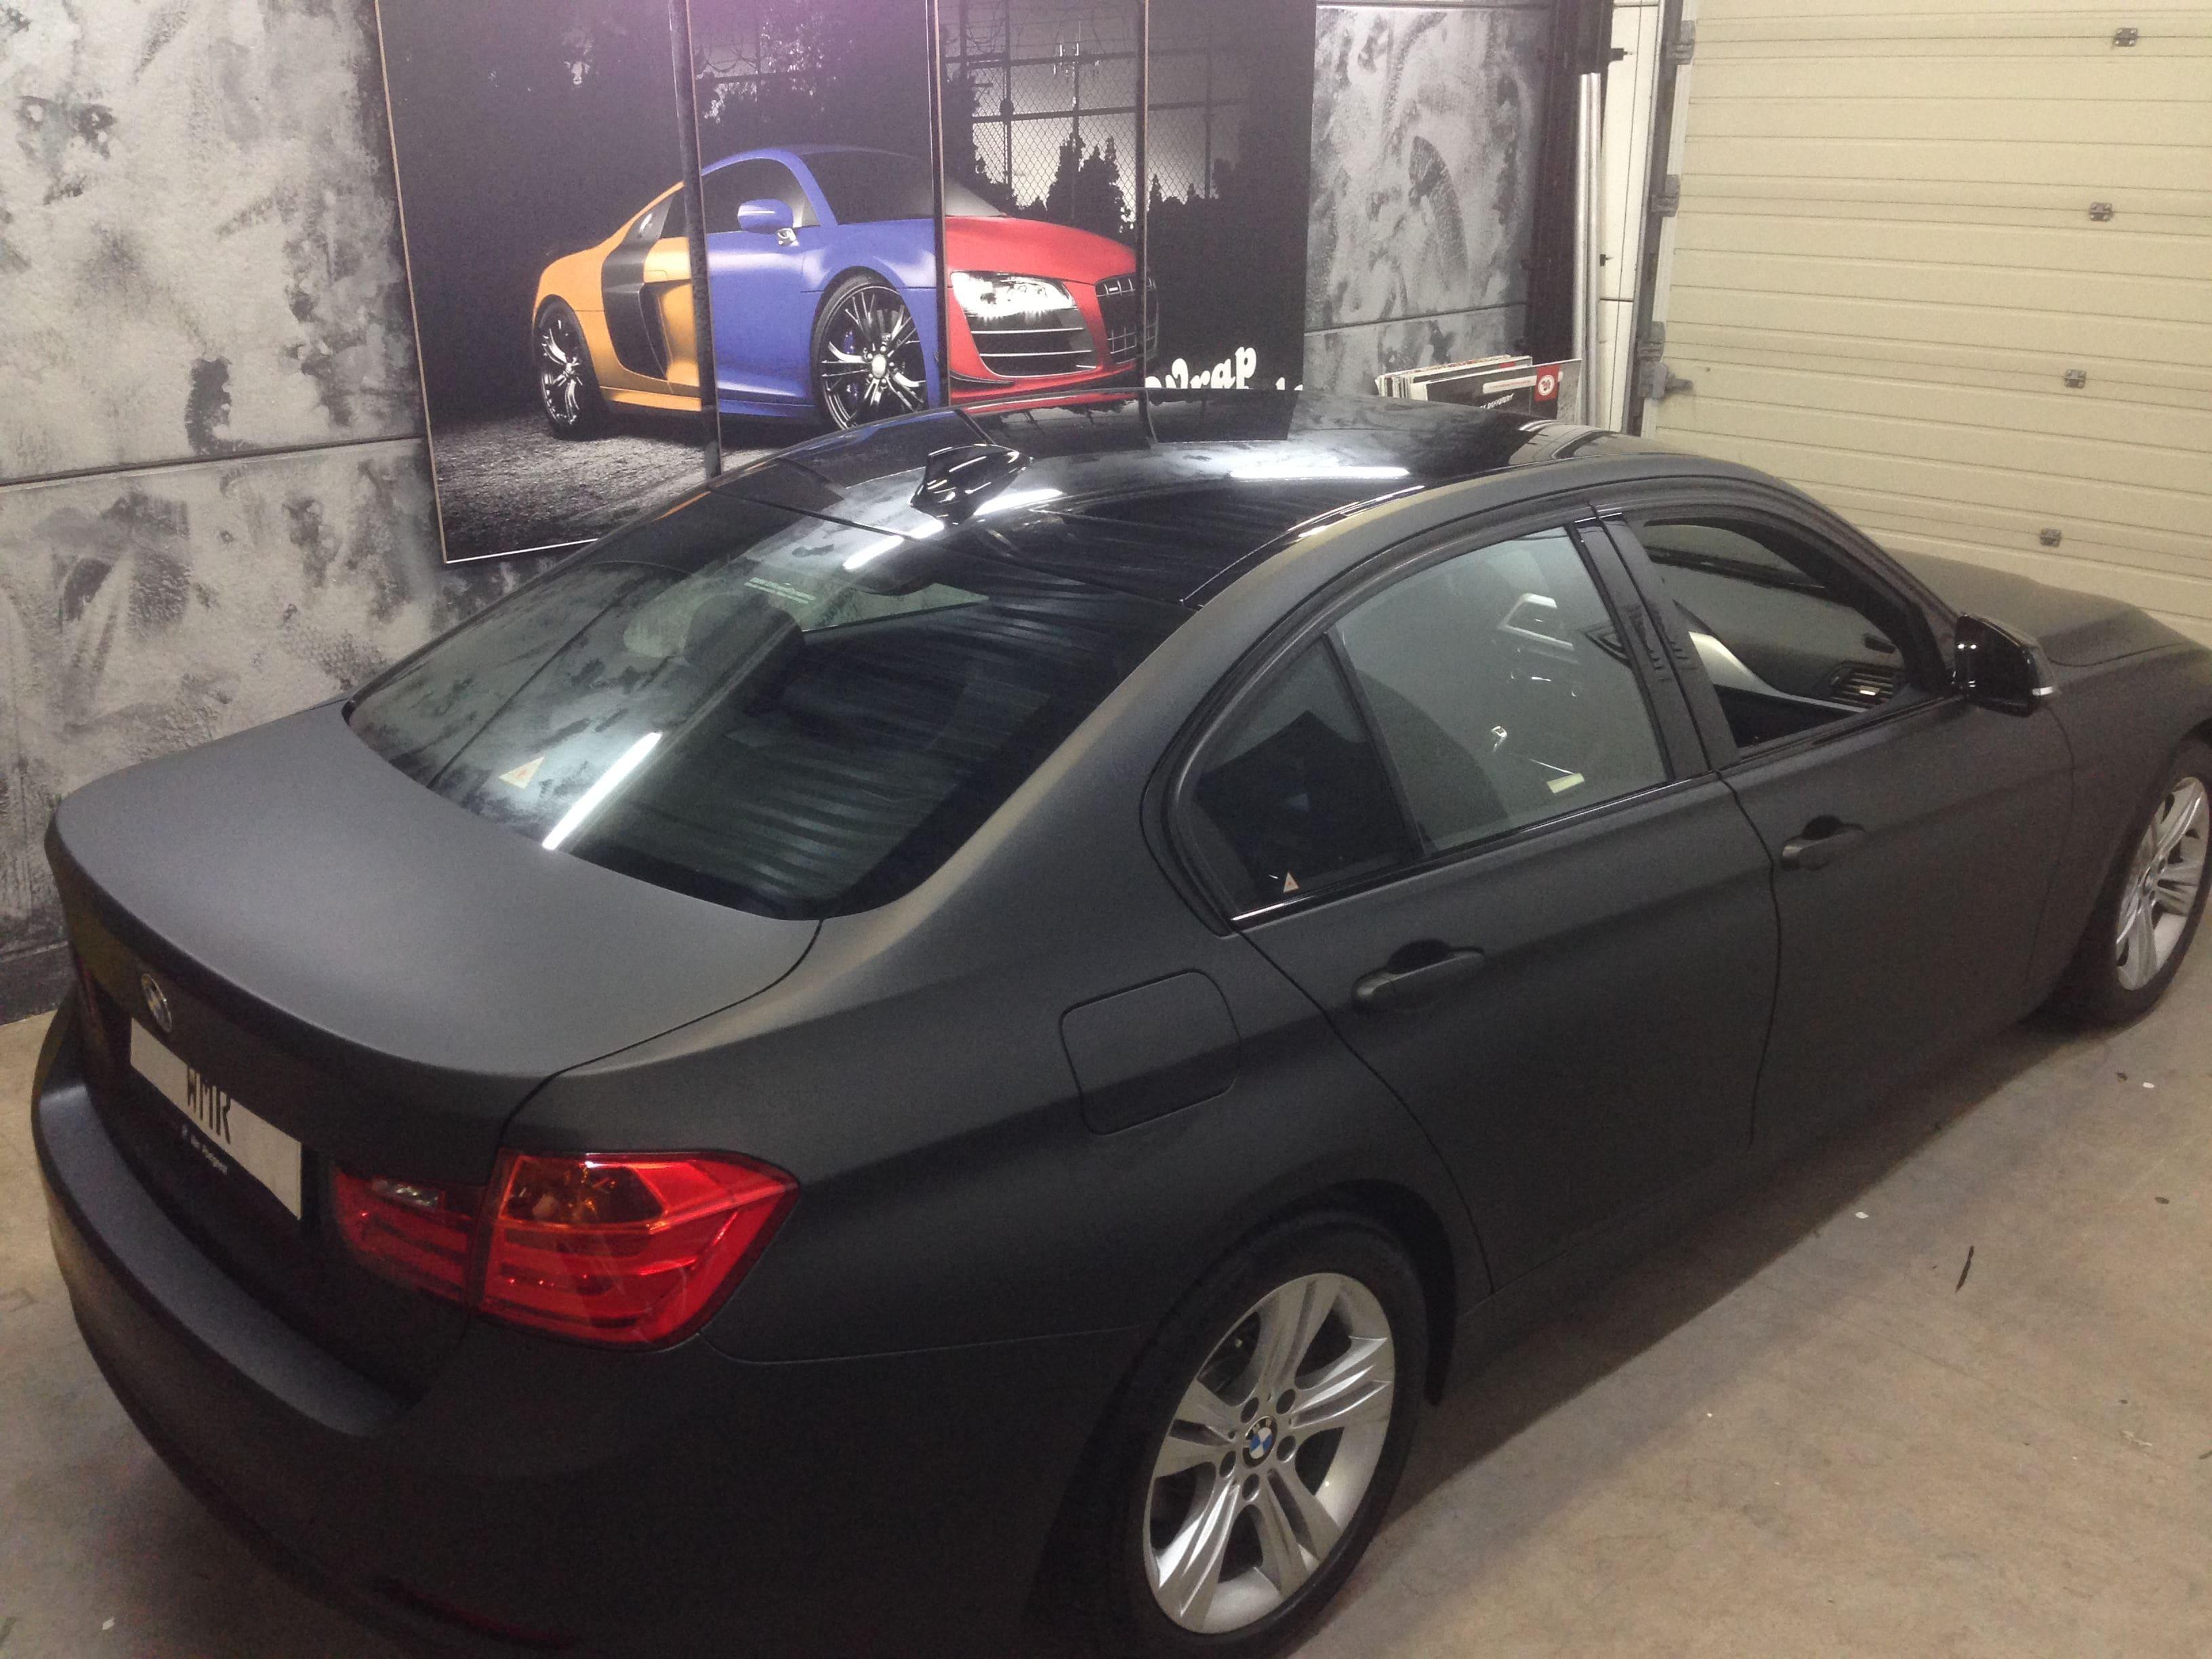 BMW E92 3 Serie met Mat Zwarte Wrap, Carwrapping door Wrapmyride.nu Foto-nr:5413, ©2021